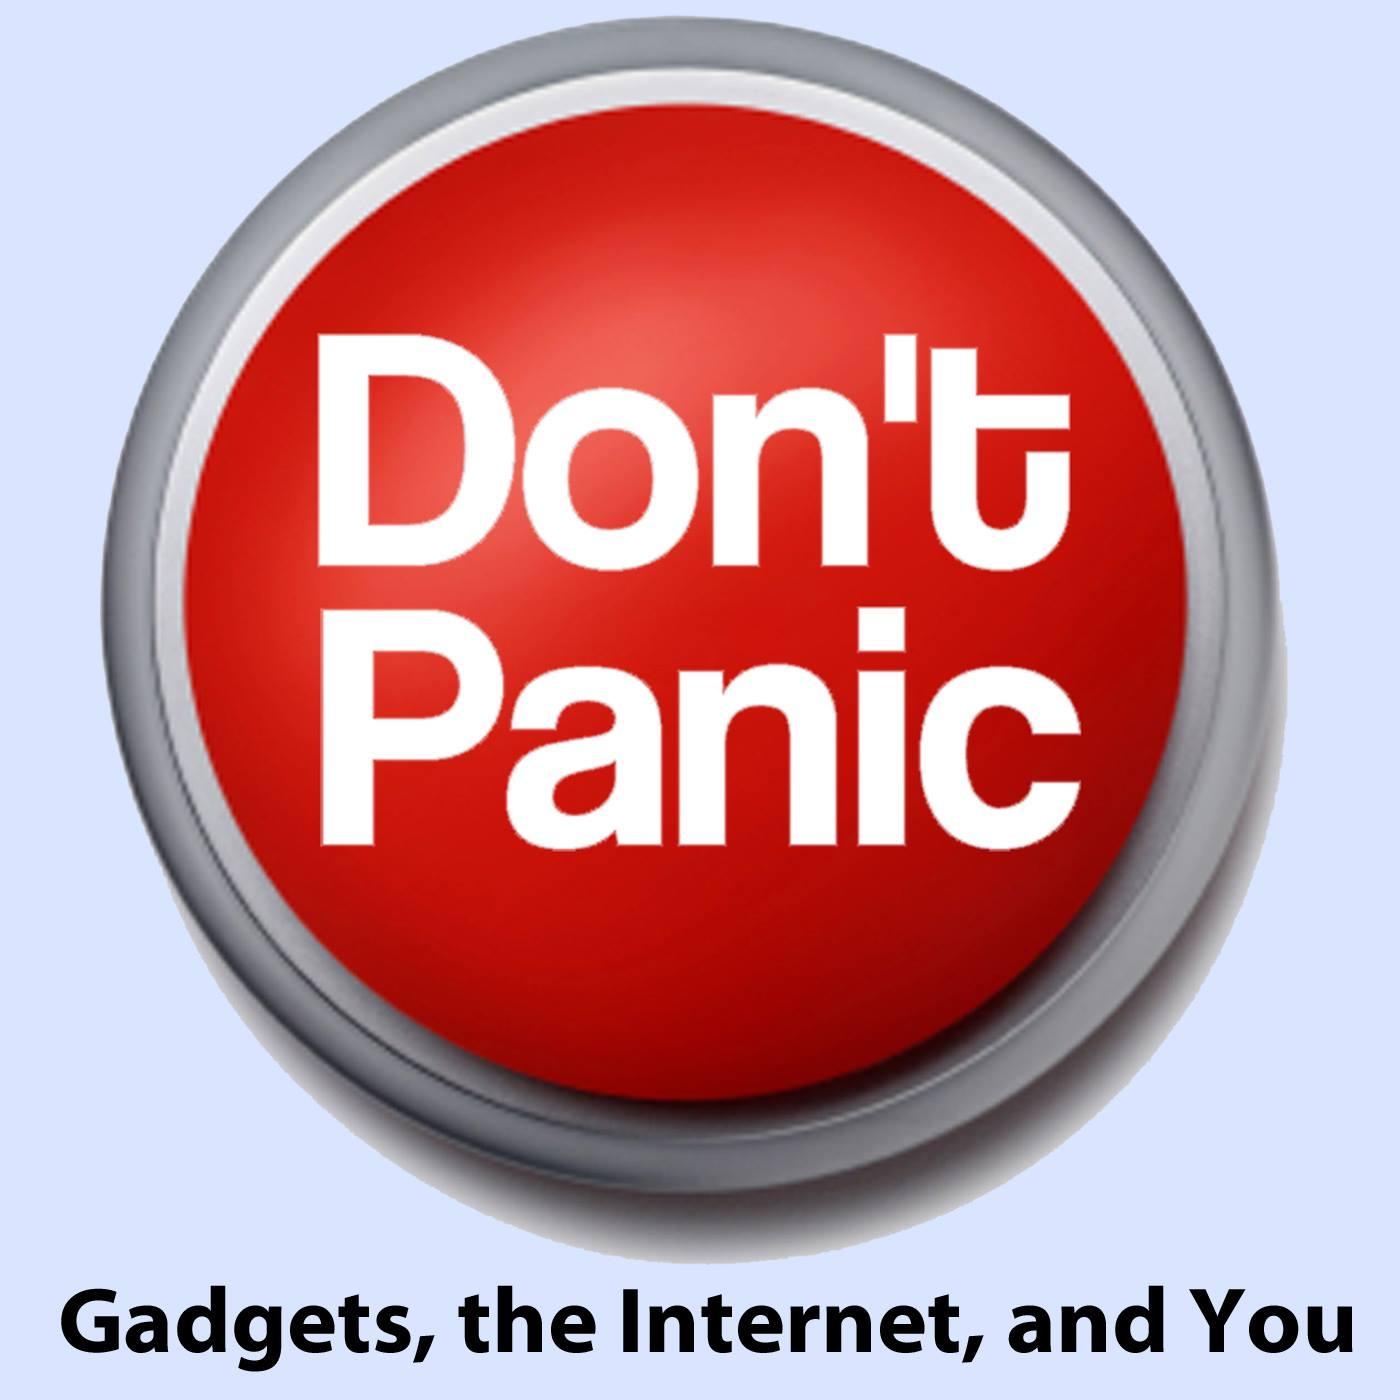 <![CDATA[Don't Panic]]>